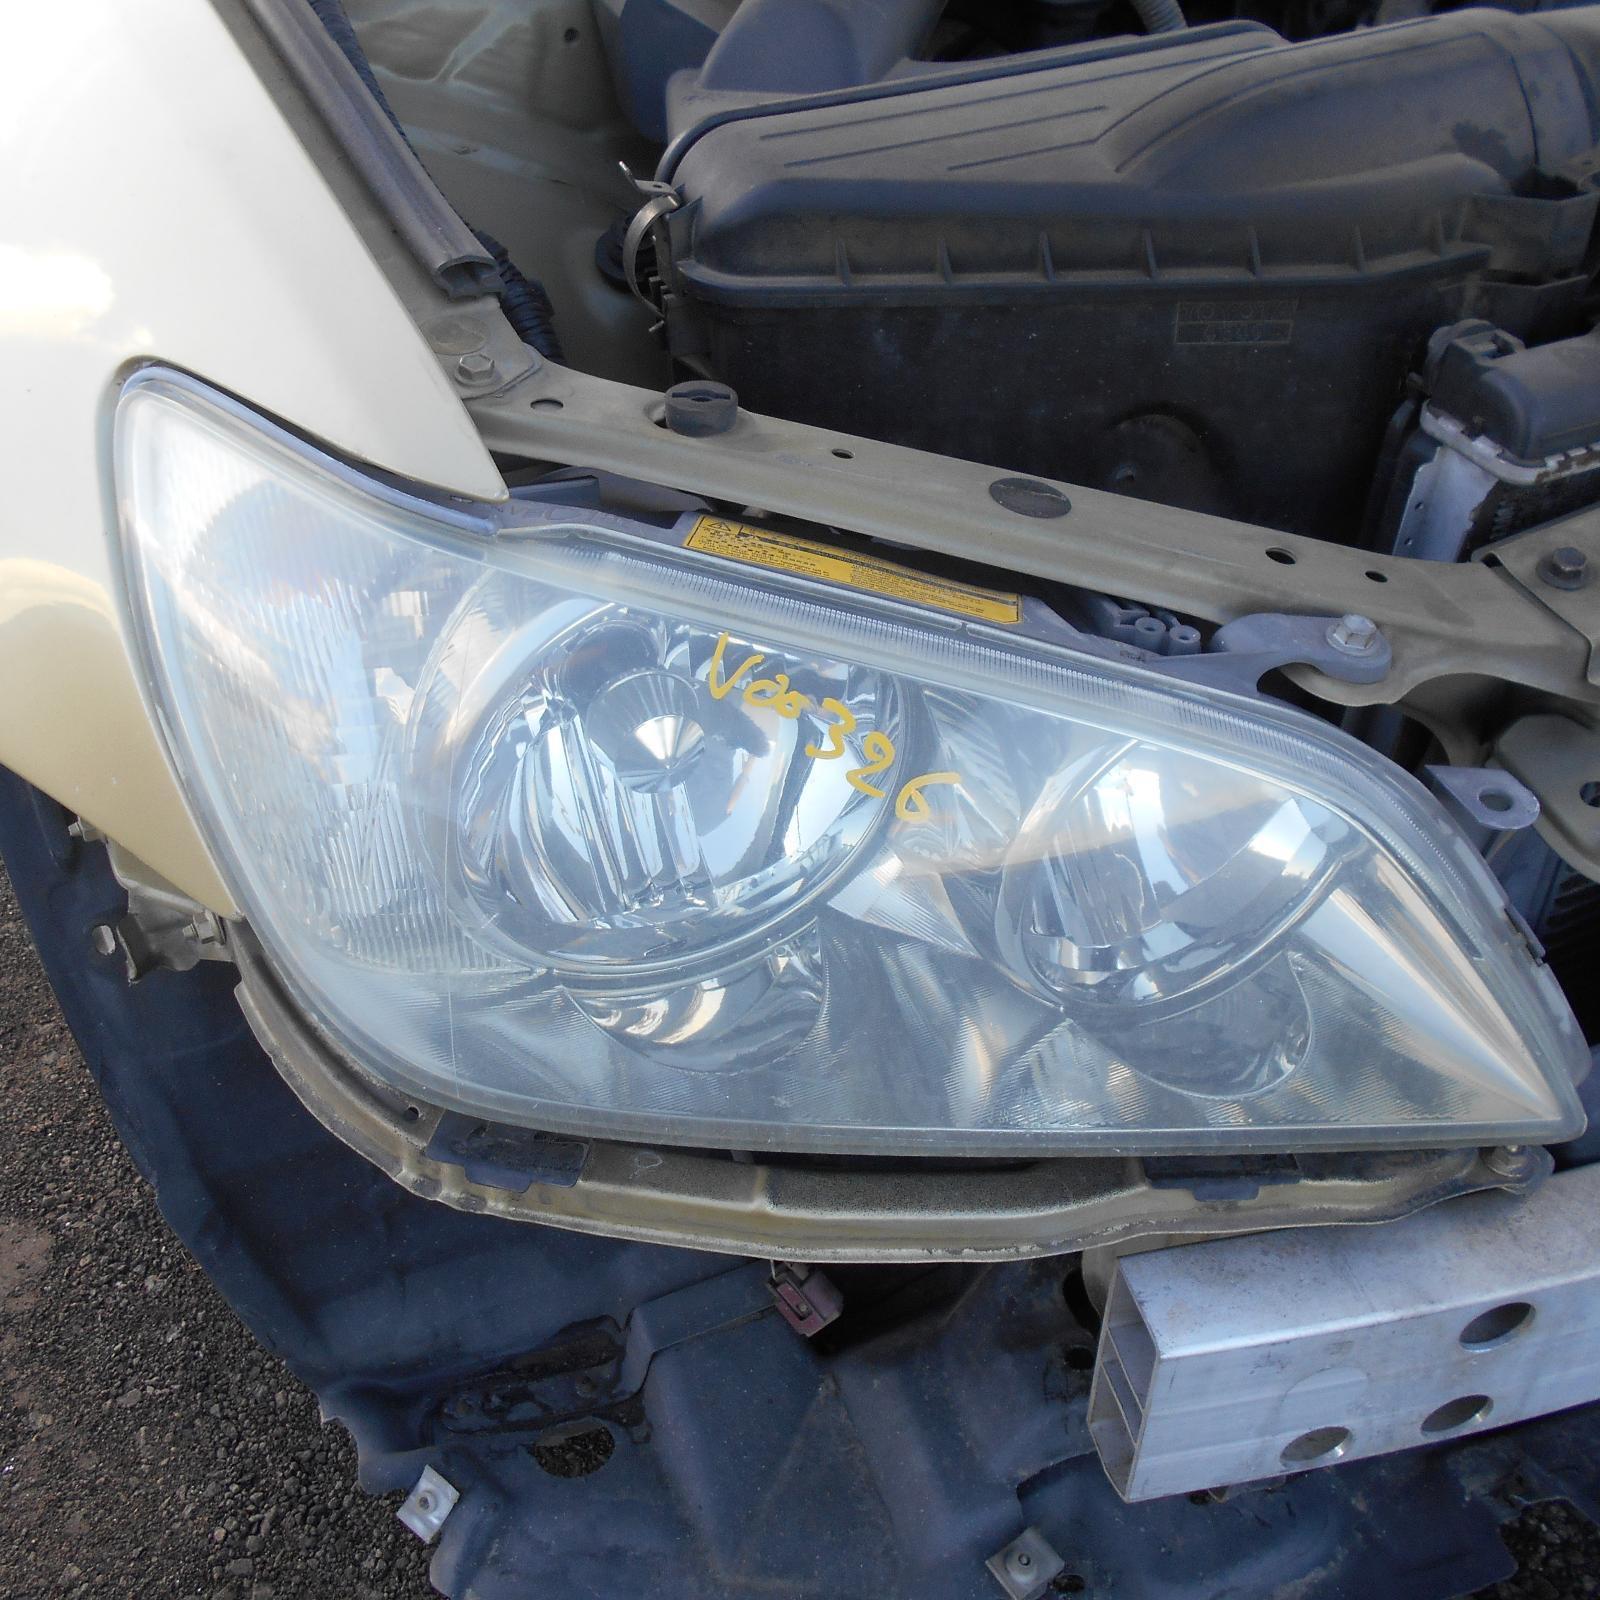 LEXUS IS200/IS300, Right Headlamp, XENON, CLEAR INDICATOR TYPE, KOITO LENS# 53-17, 08/01-07/05